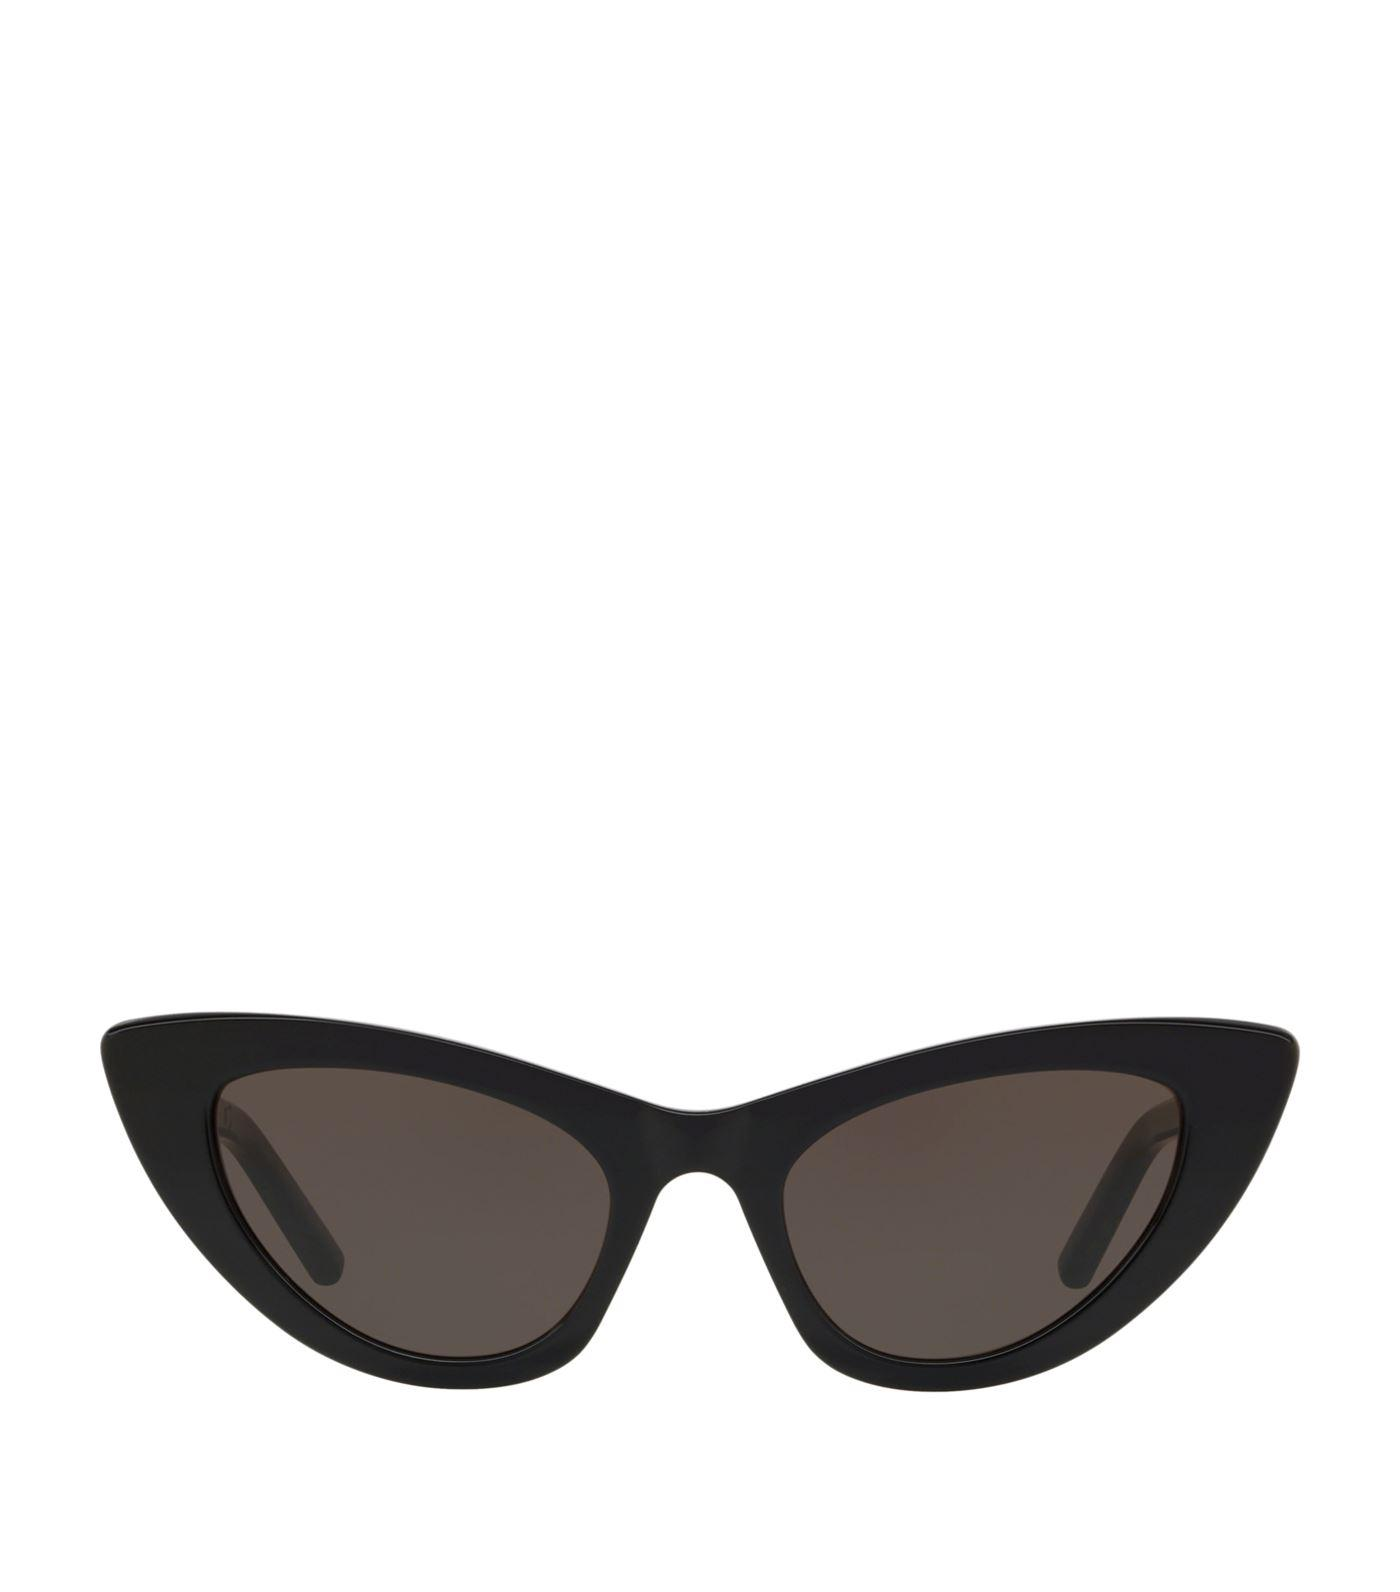 05d0657779 Saint Laurent Lily Cat Eye Sunglasses in Black - Lyst